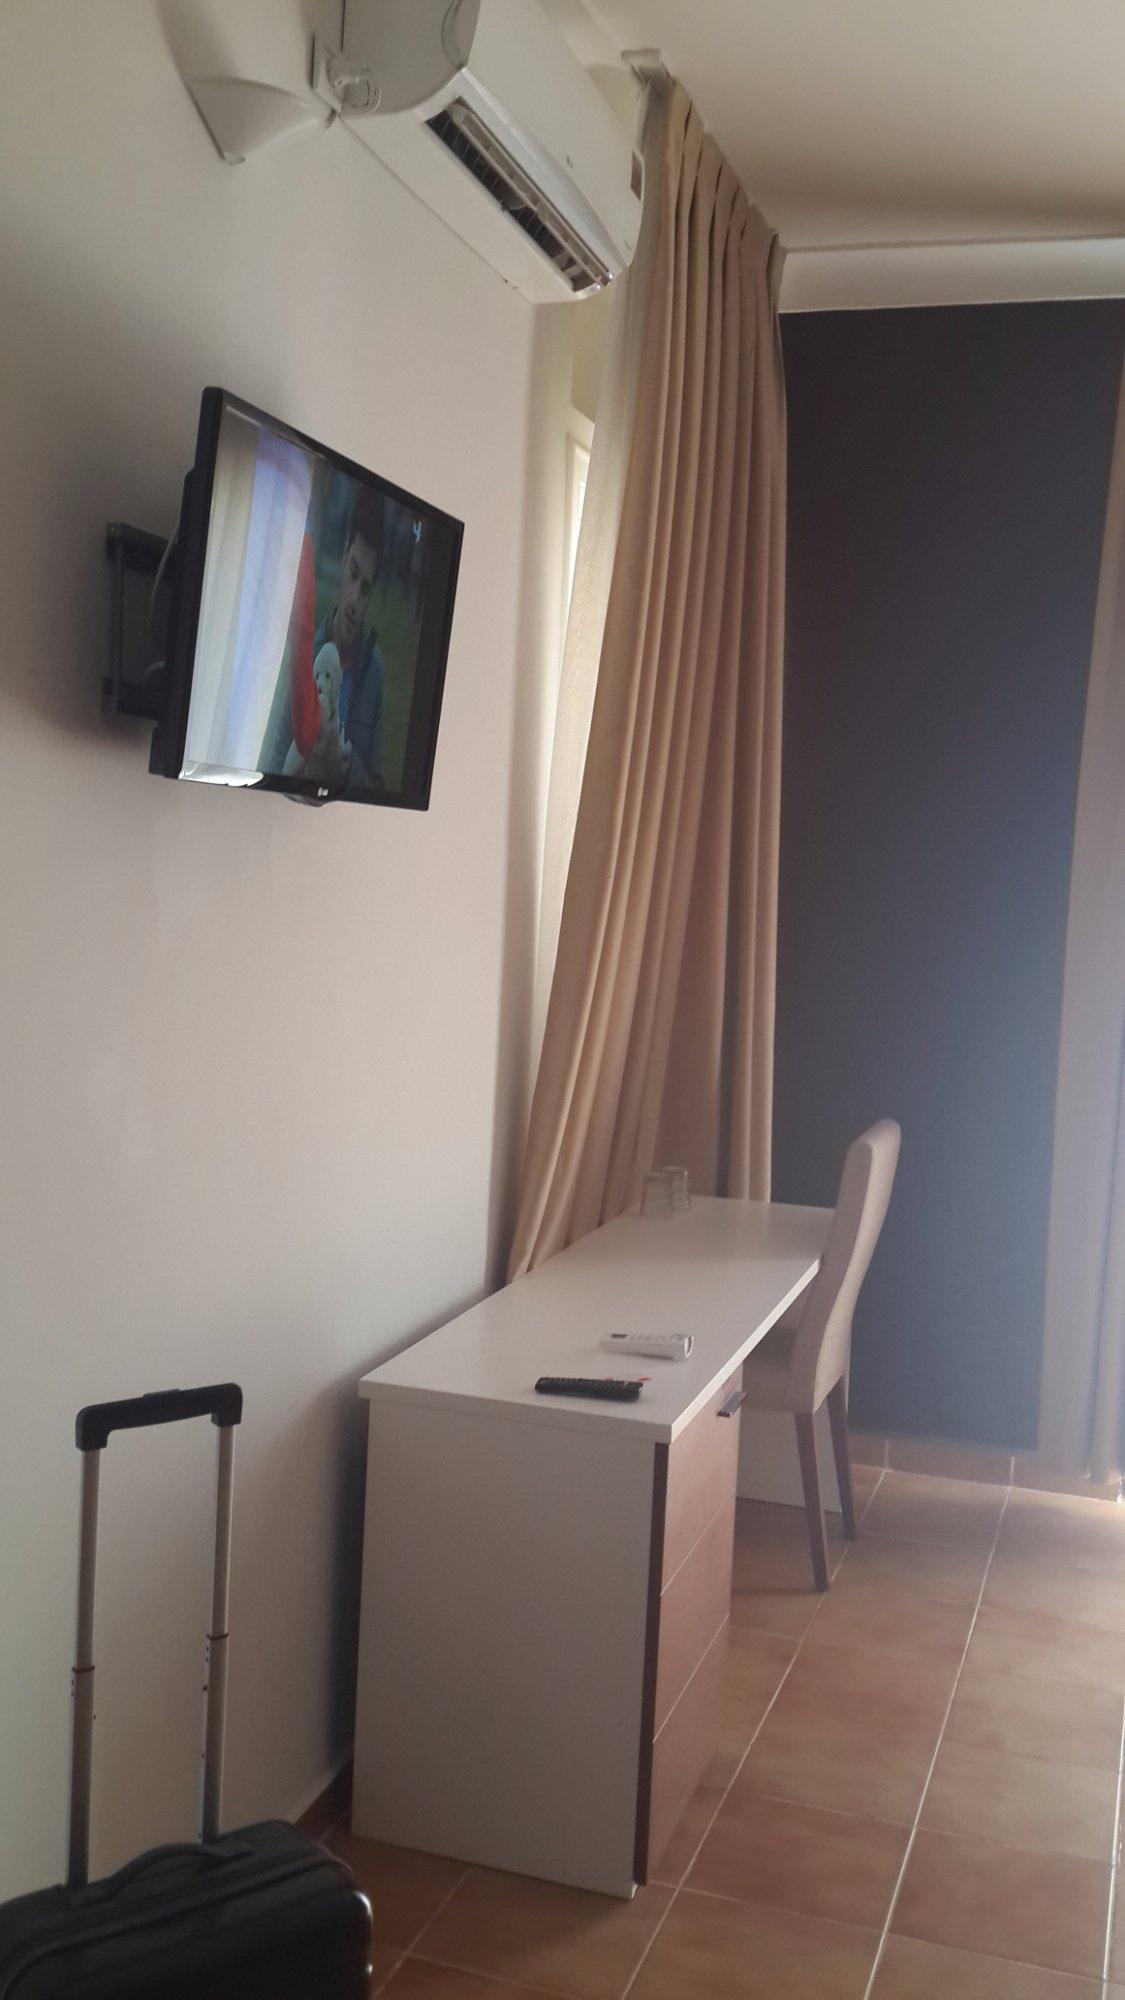 Hotel relax tlemcen algerije foto 39 s reviews en prijsvergelijking tripadvisor - Kamer van bian ...